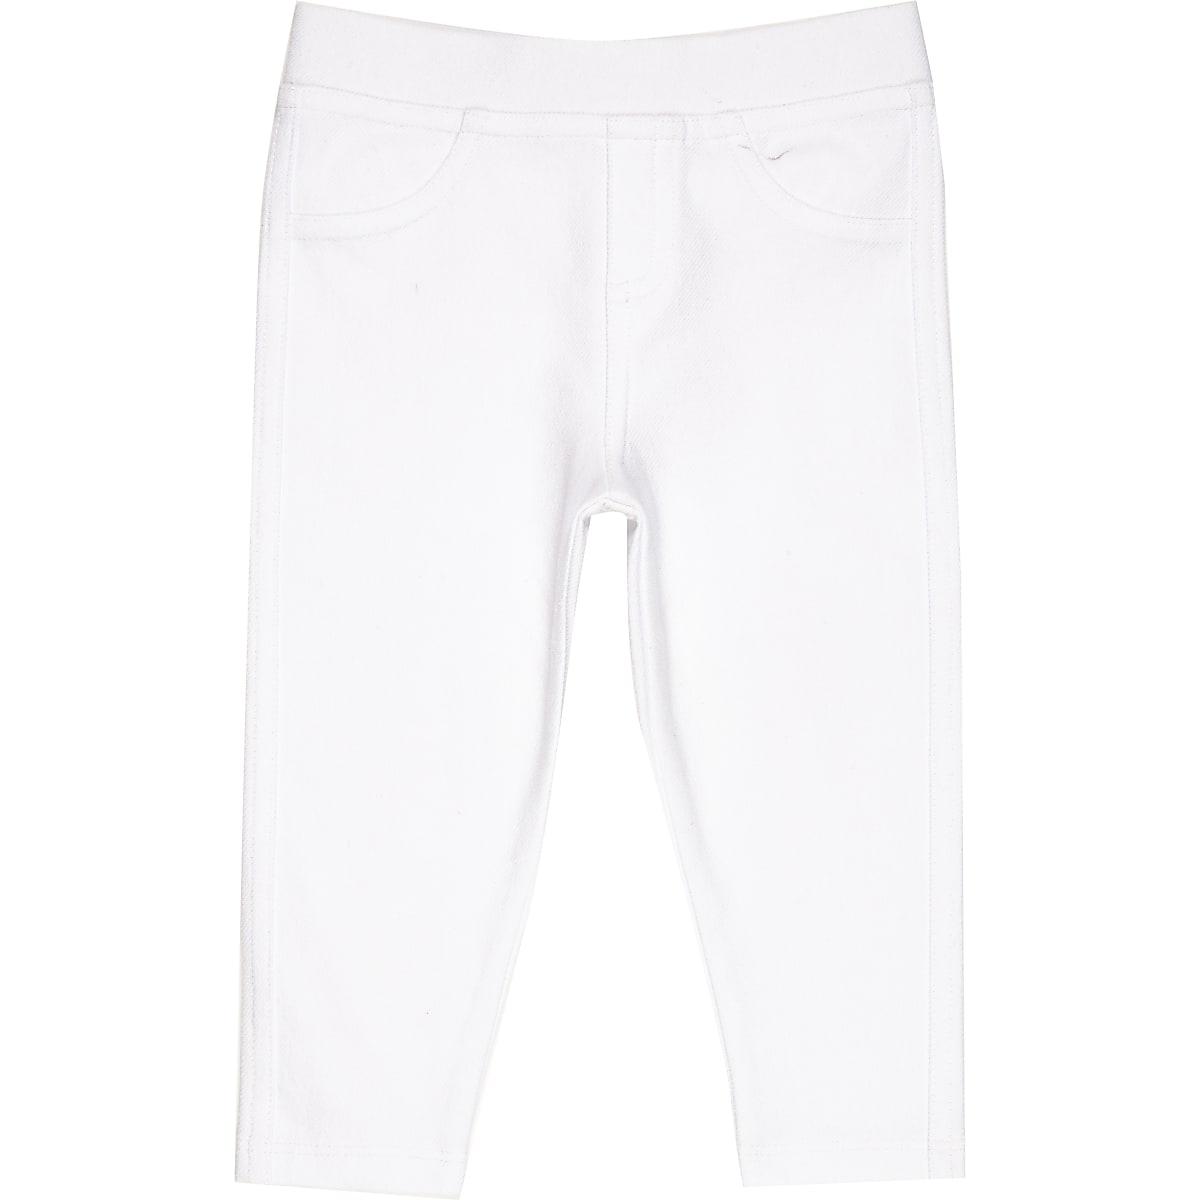 Witte leggings met denimlook voor mini girls